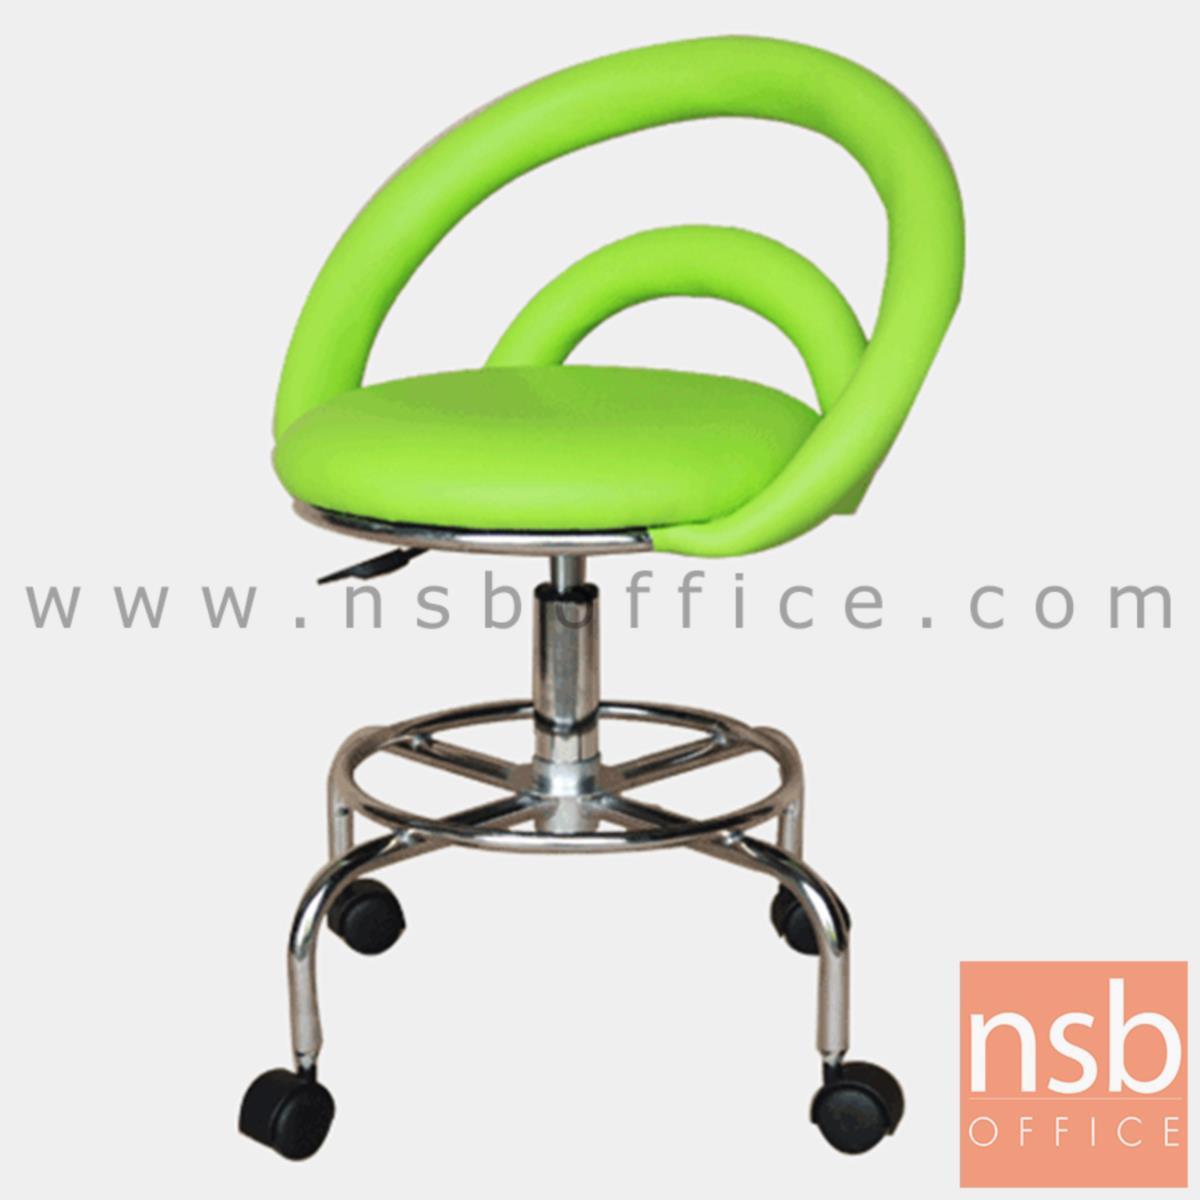 B09A104:เก้าอี้บาร์สตูลที่นั่งกลมล้อเลื่อน รุ่น Rio (ริโอ้)  โช๊คแก๊ส ขาเหล็กชุบโครเมี่ยม